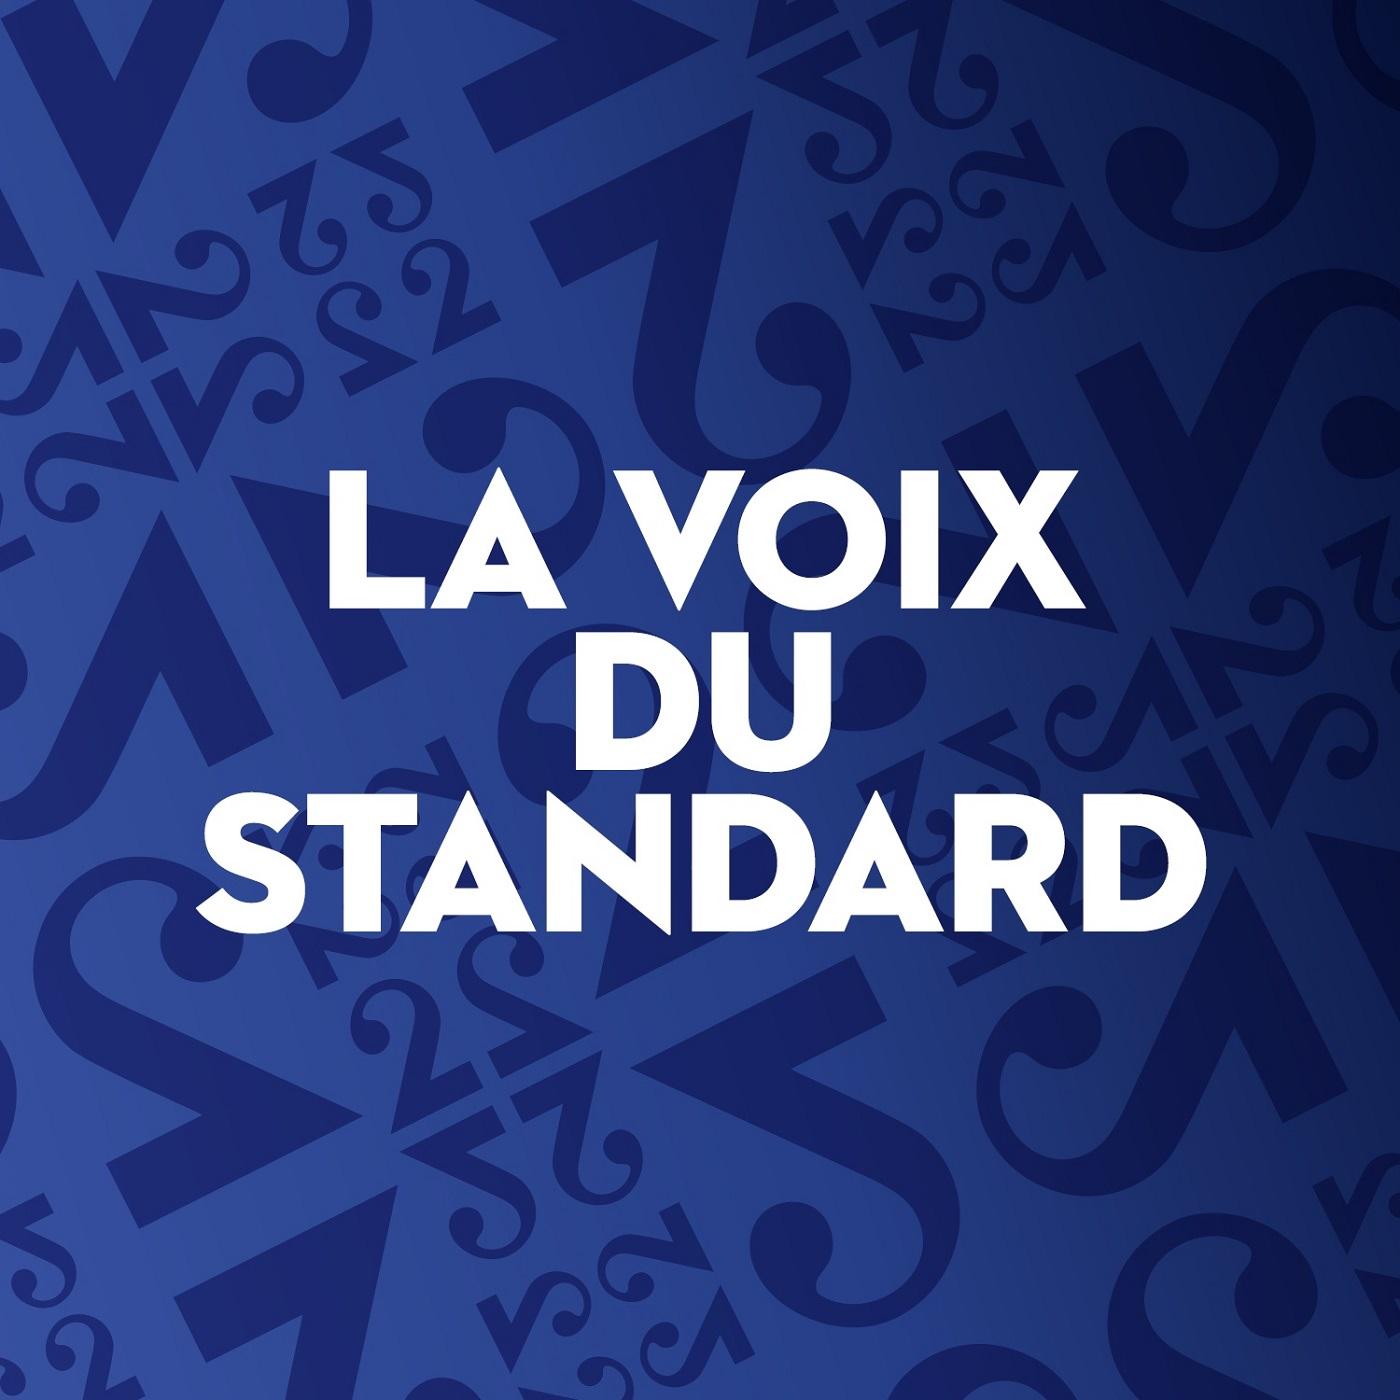 La voix du standard (logo podcast) [RTS]